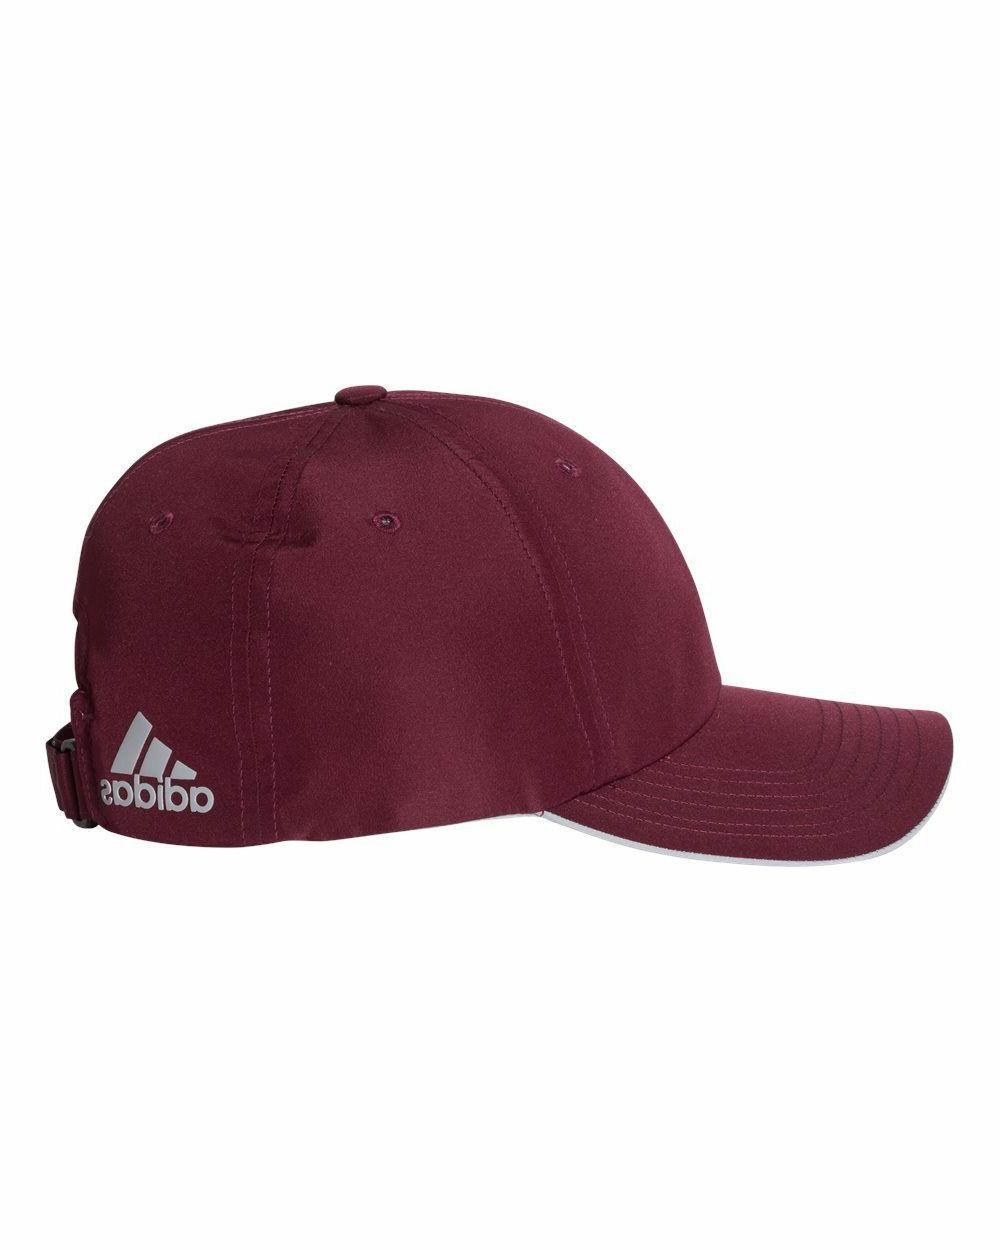 ADIDAS - Adjustable HAT, NEW Performance